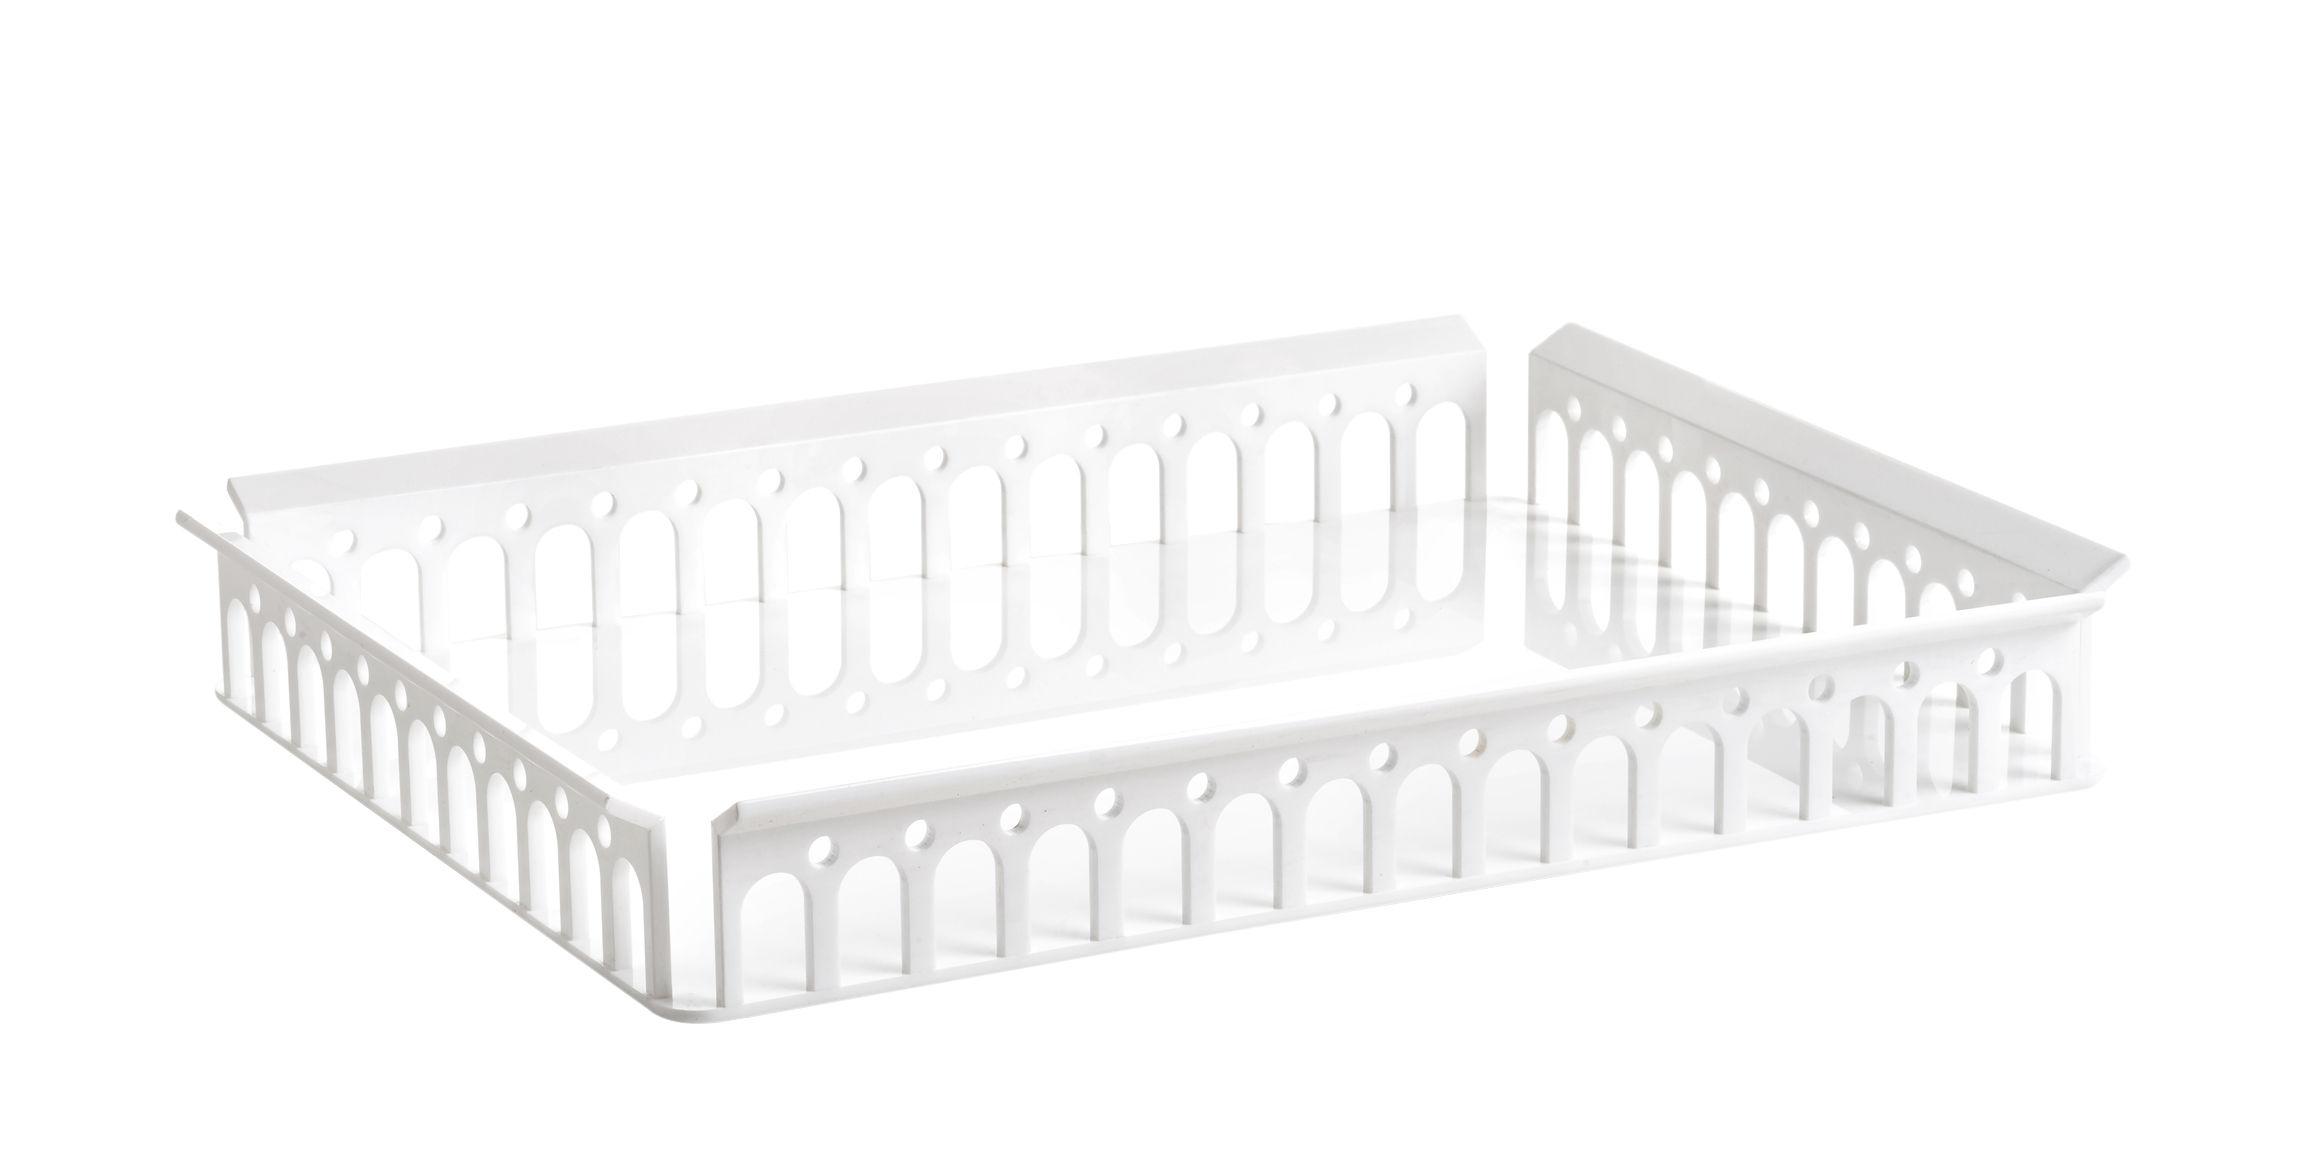 Tavola - Vassoi  - Piano/vassoio Piazza - / 48 x 37 cm di Kartell - Bianco opaco - Technopolymère thermoplastique